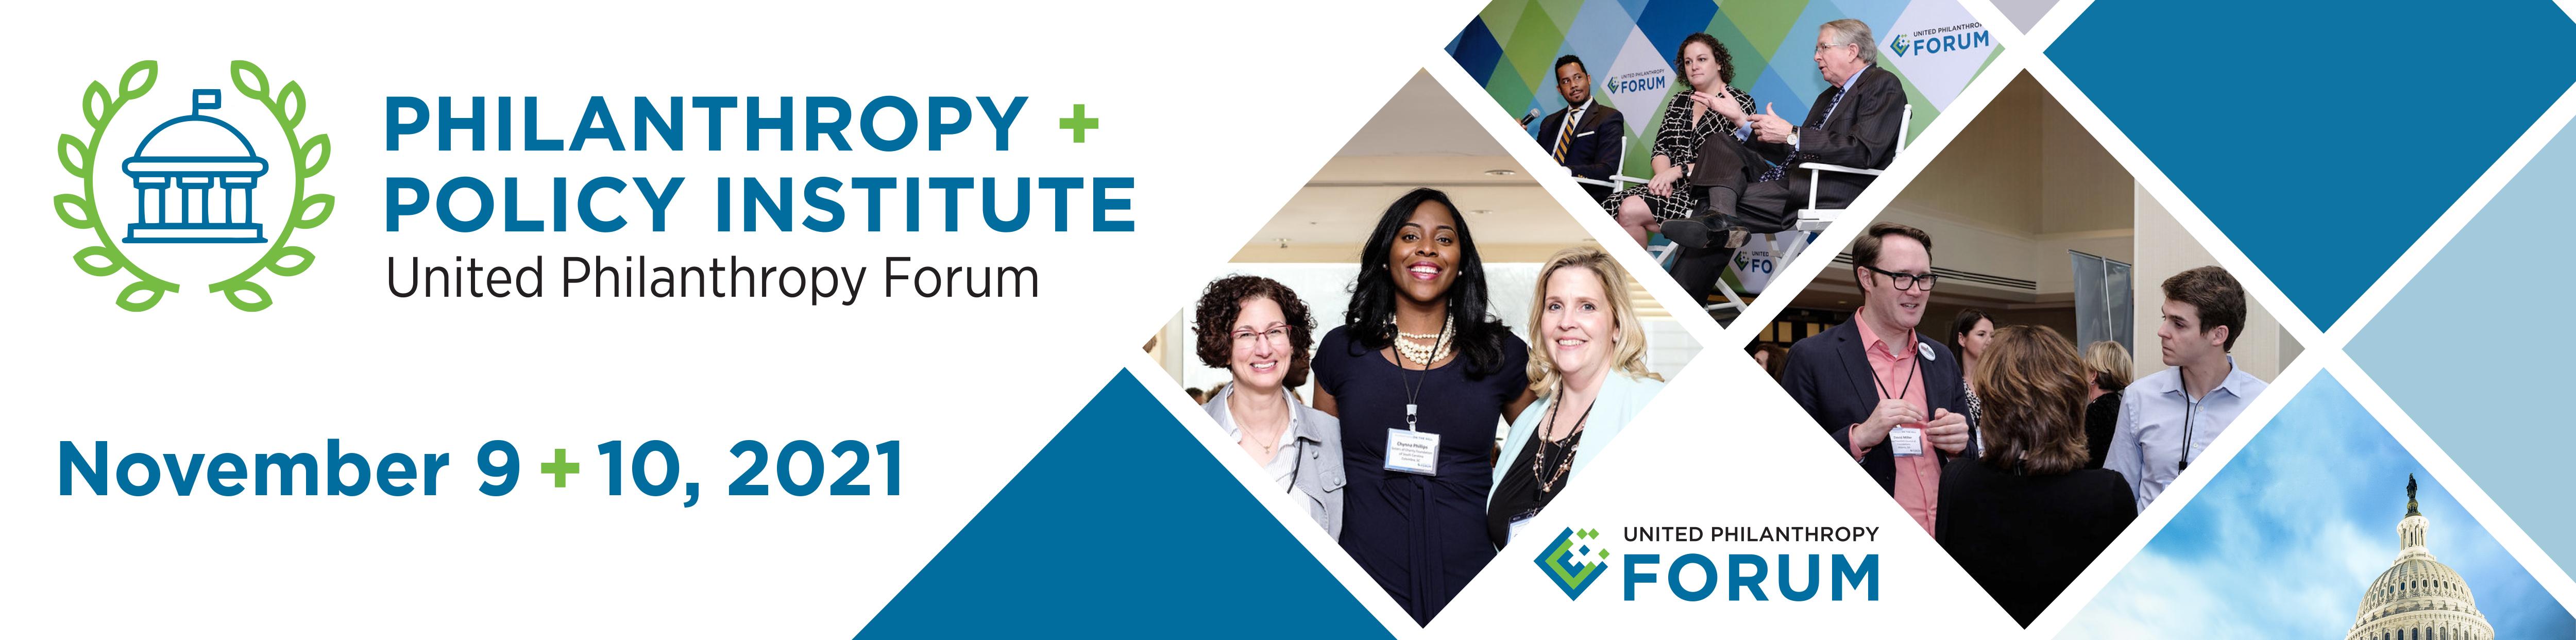 Philanthropy + Policy Institute: November 9-10, 2021